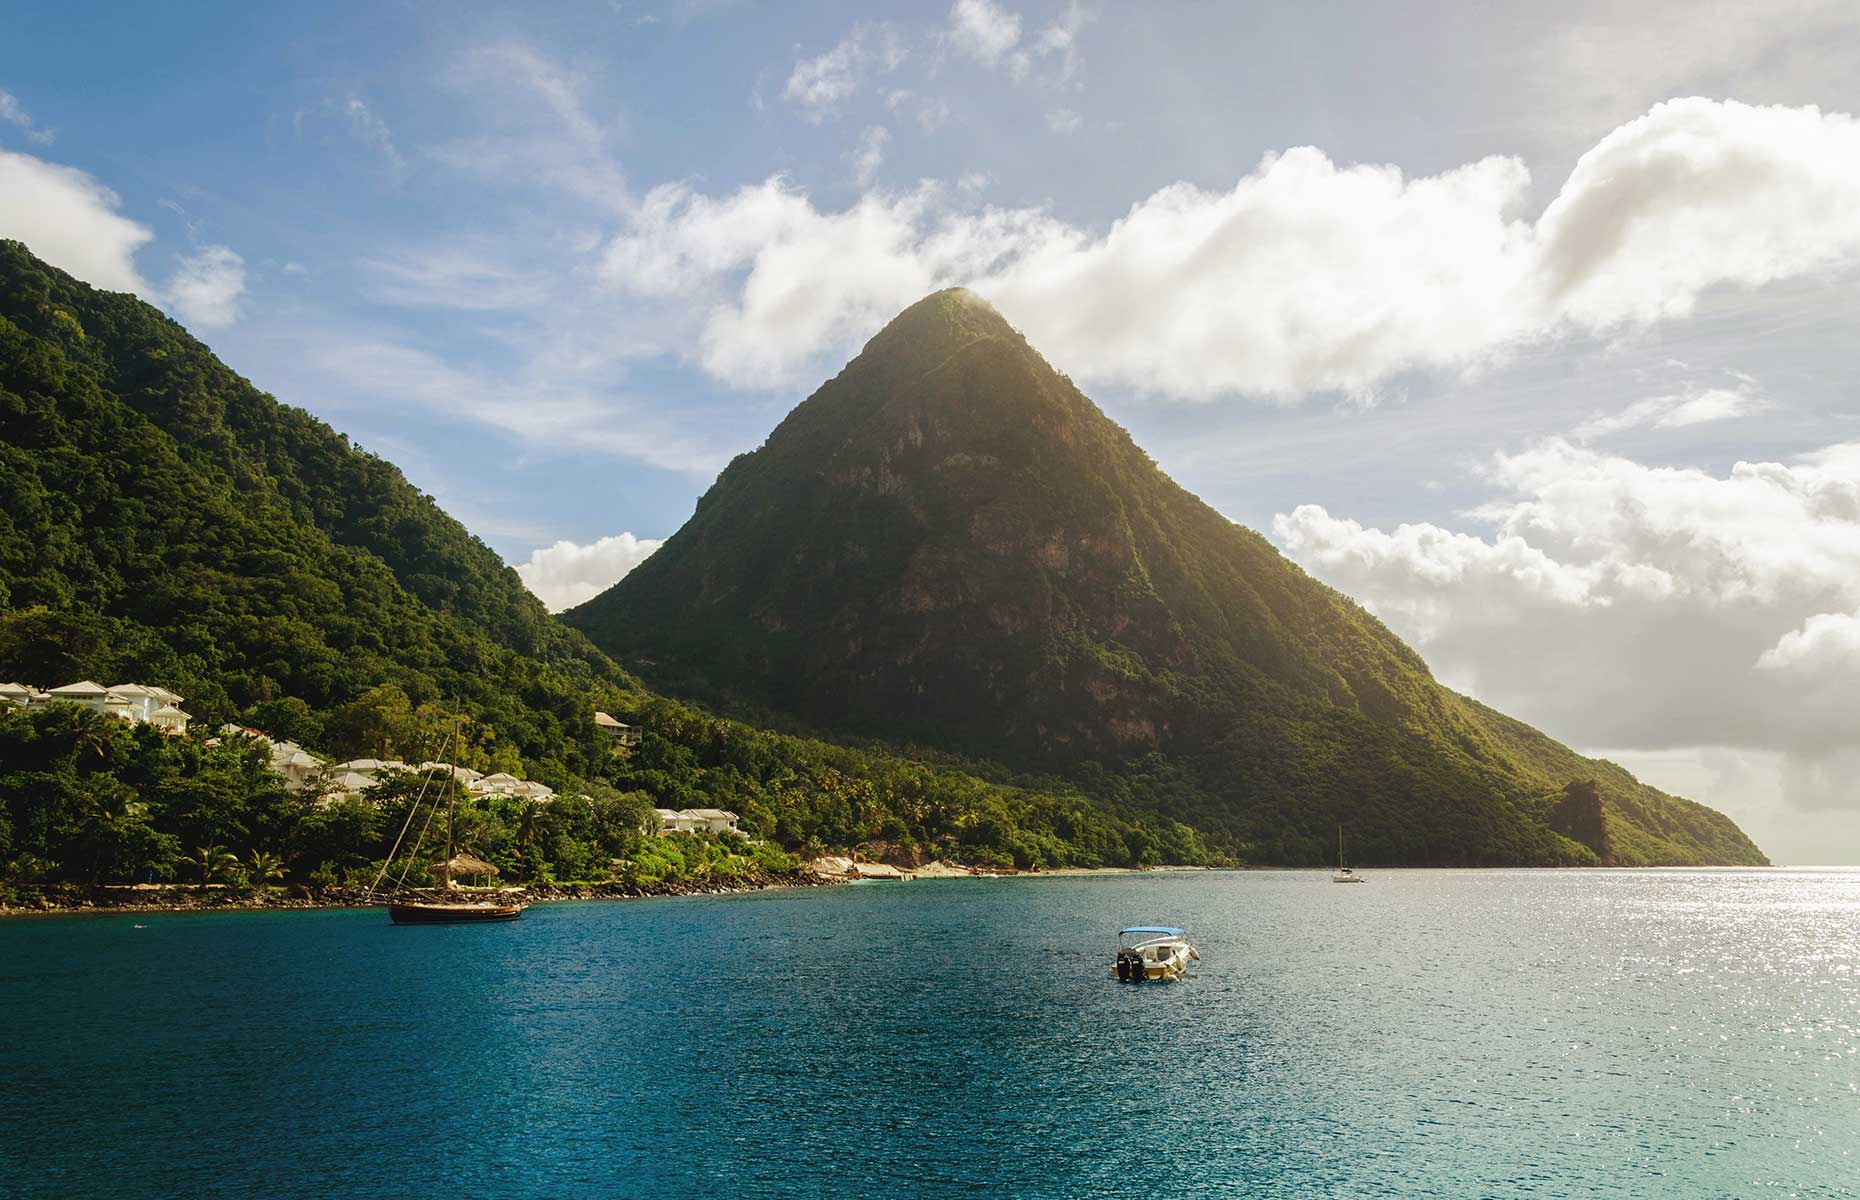 The Pitons, Saint Lucia (Image: Claudio Trigueros/Unsplash)